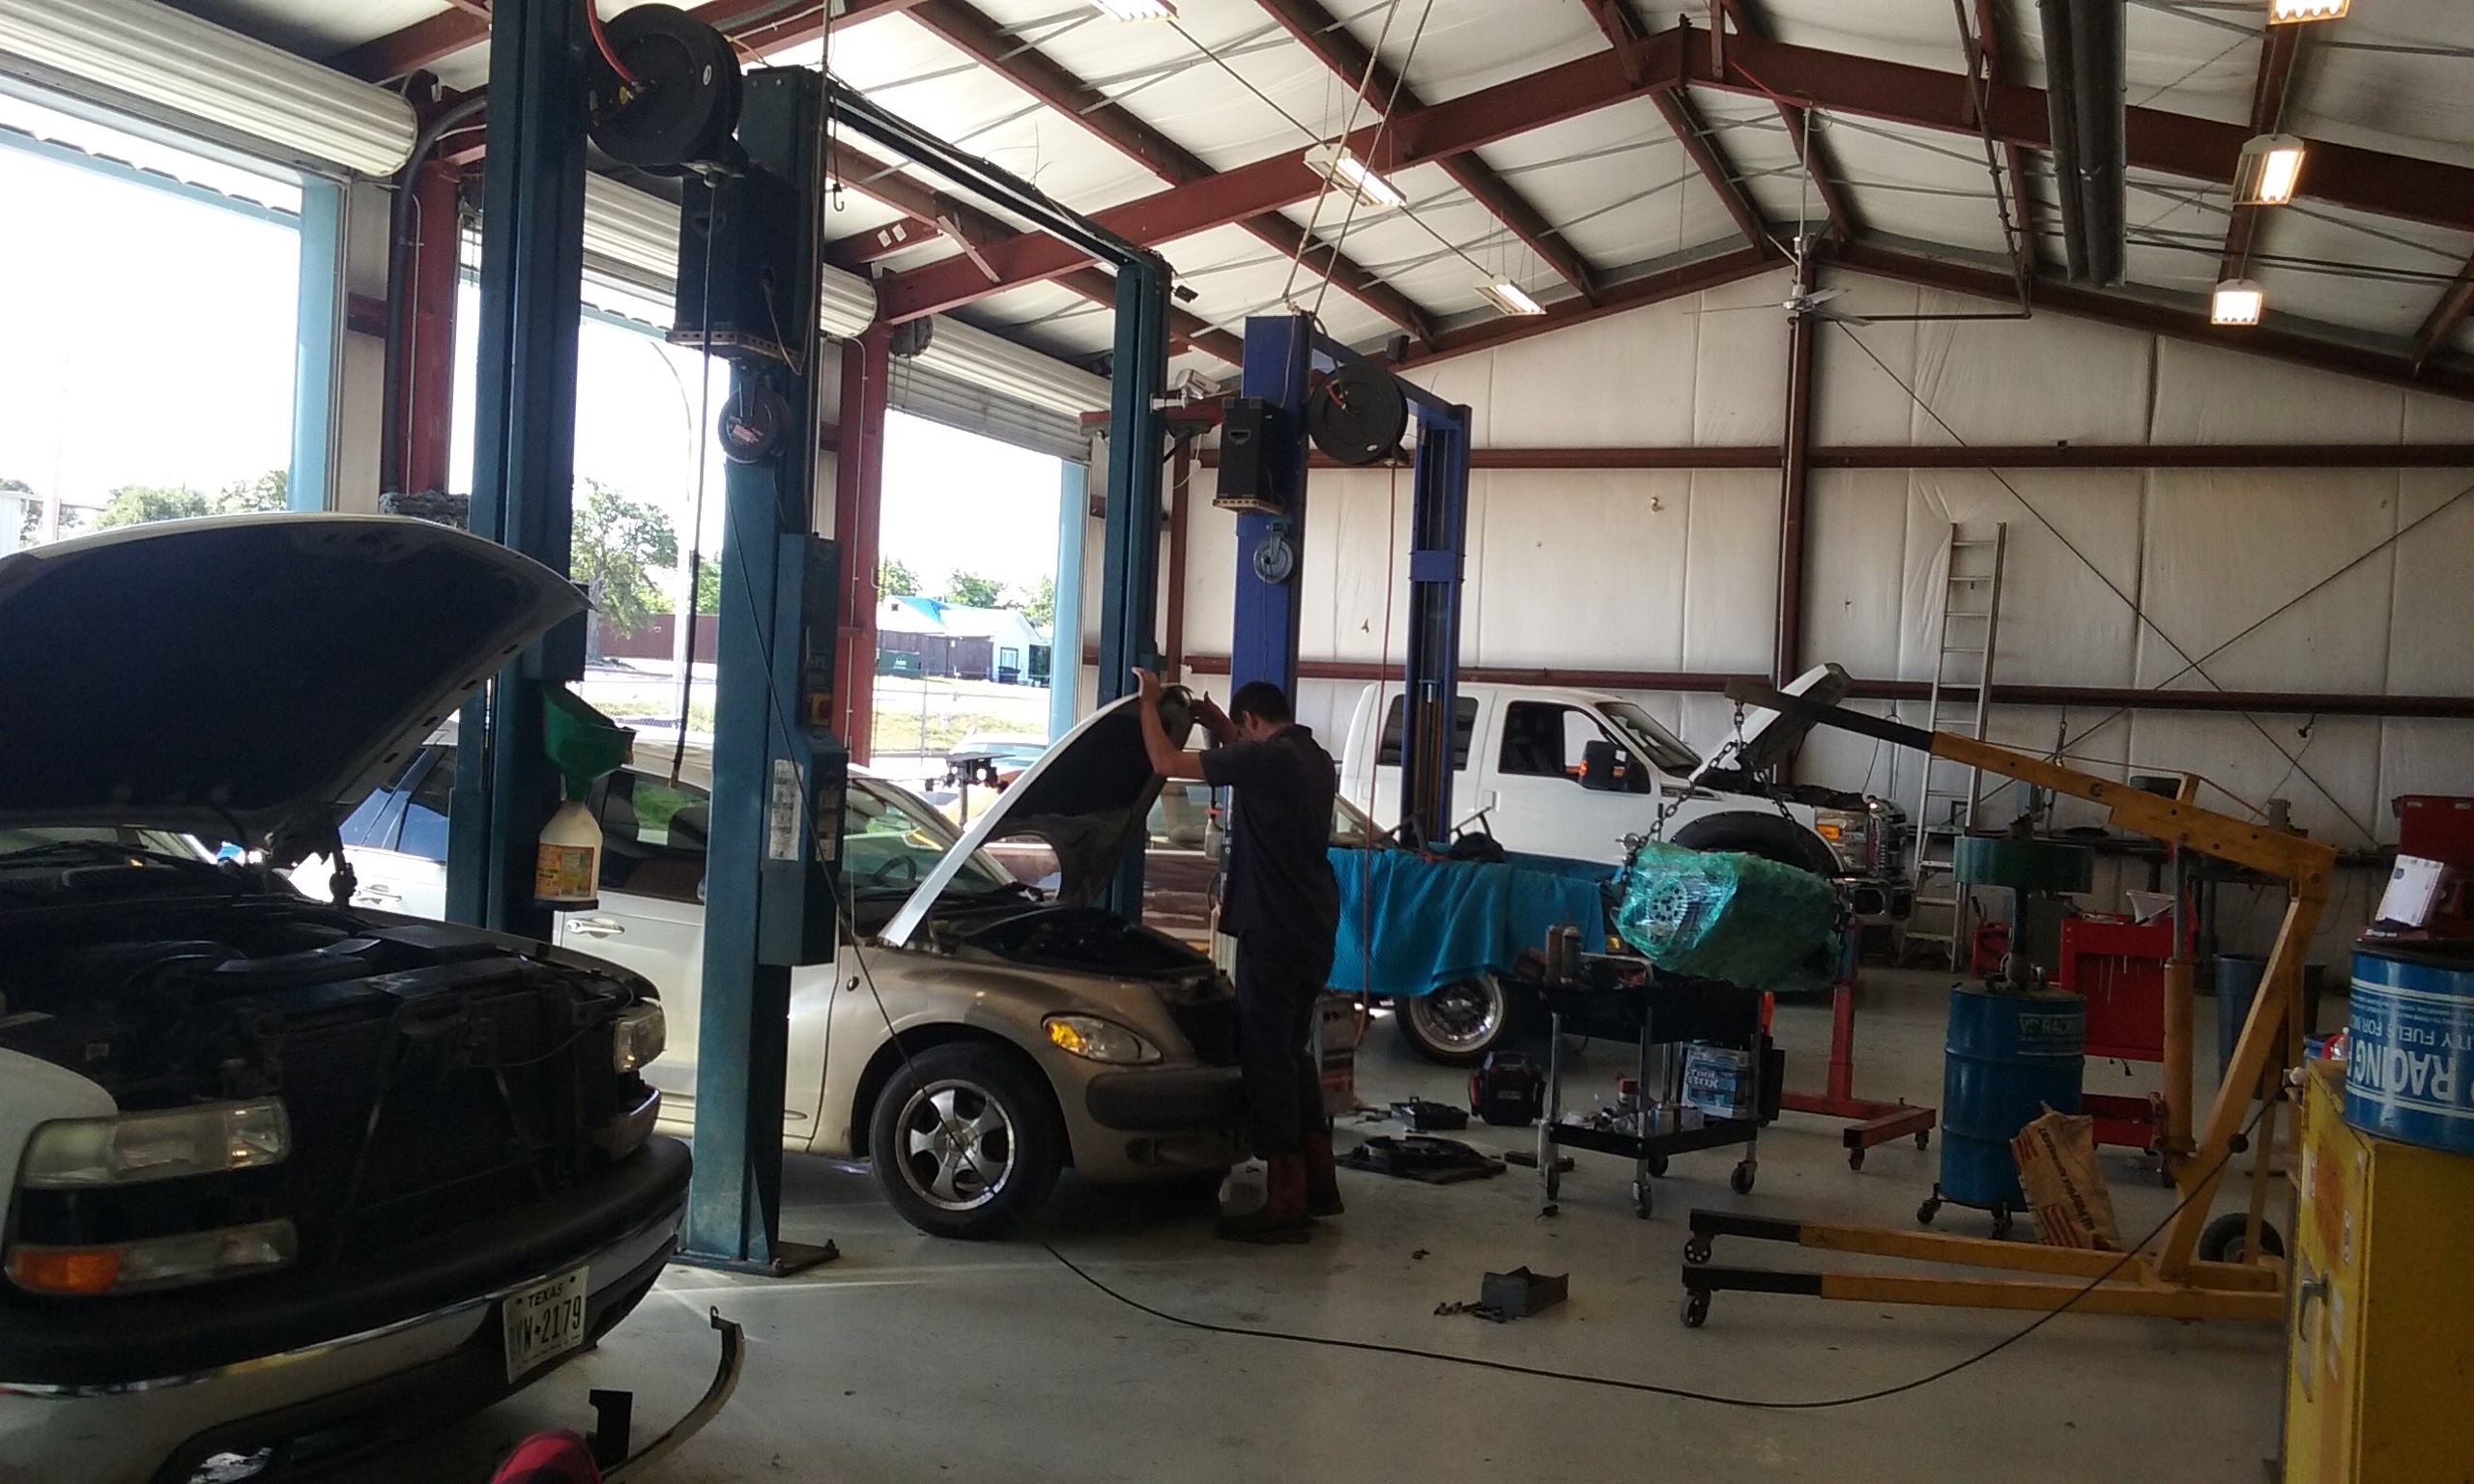 Affordable auto a c repair 3124 reagan dr fort worth tx 76116 affordable auto a c repair 3124 reagan dr fort worth tx 76116 yp solutioingenieria Gallery